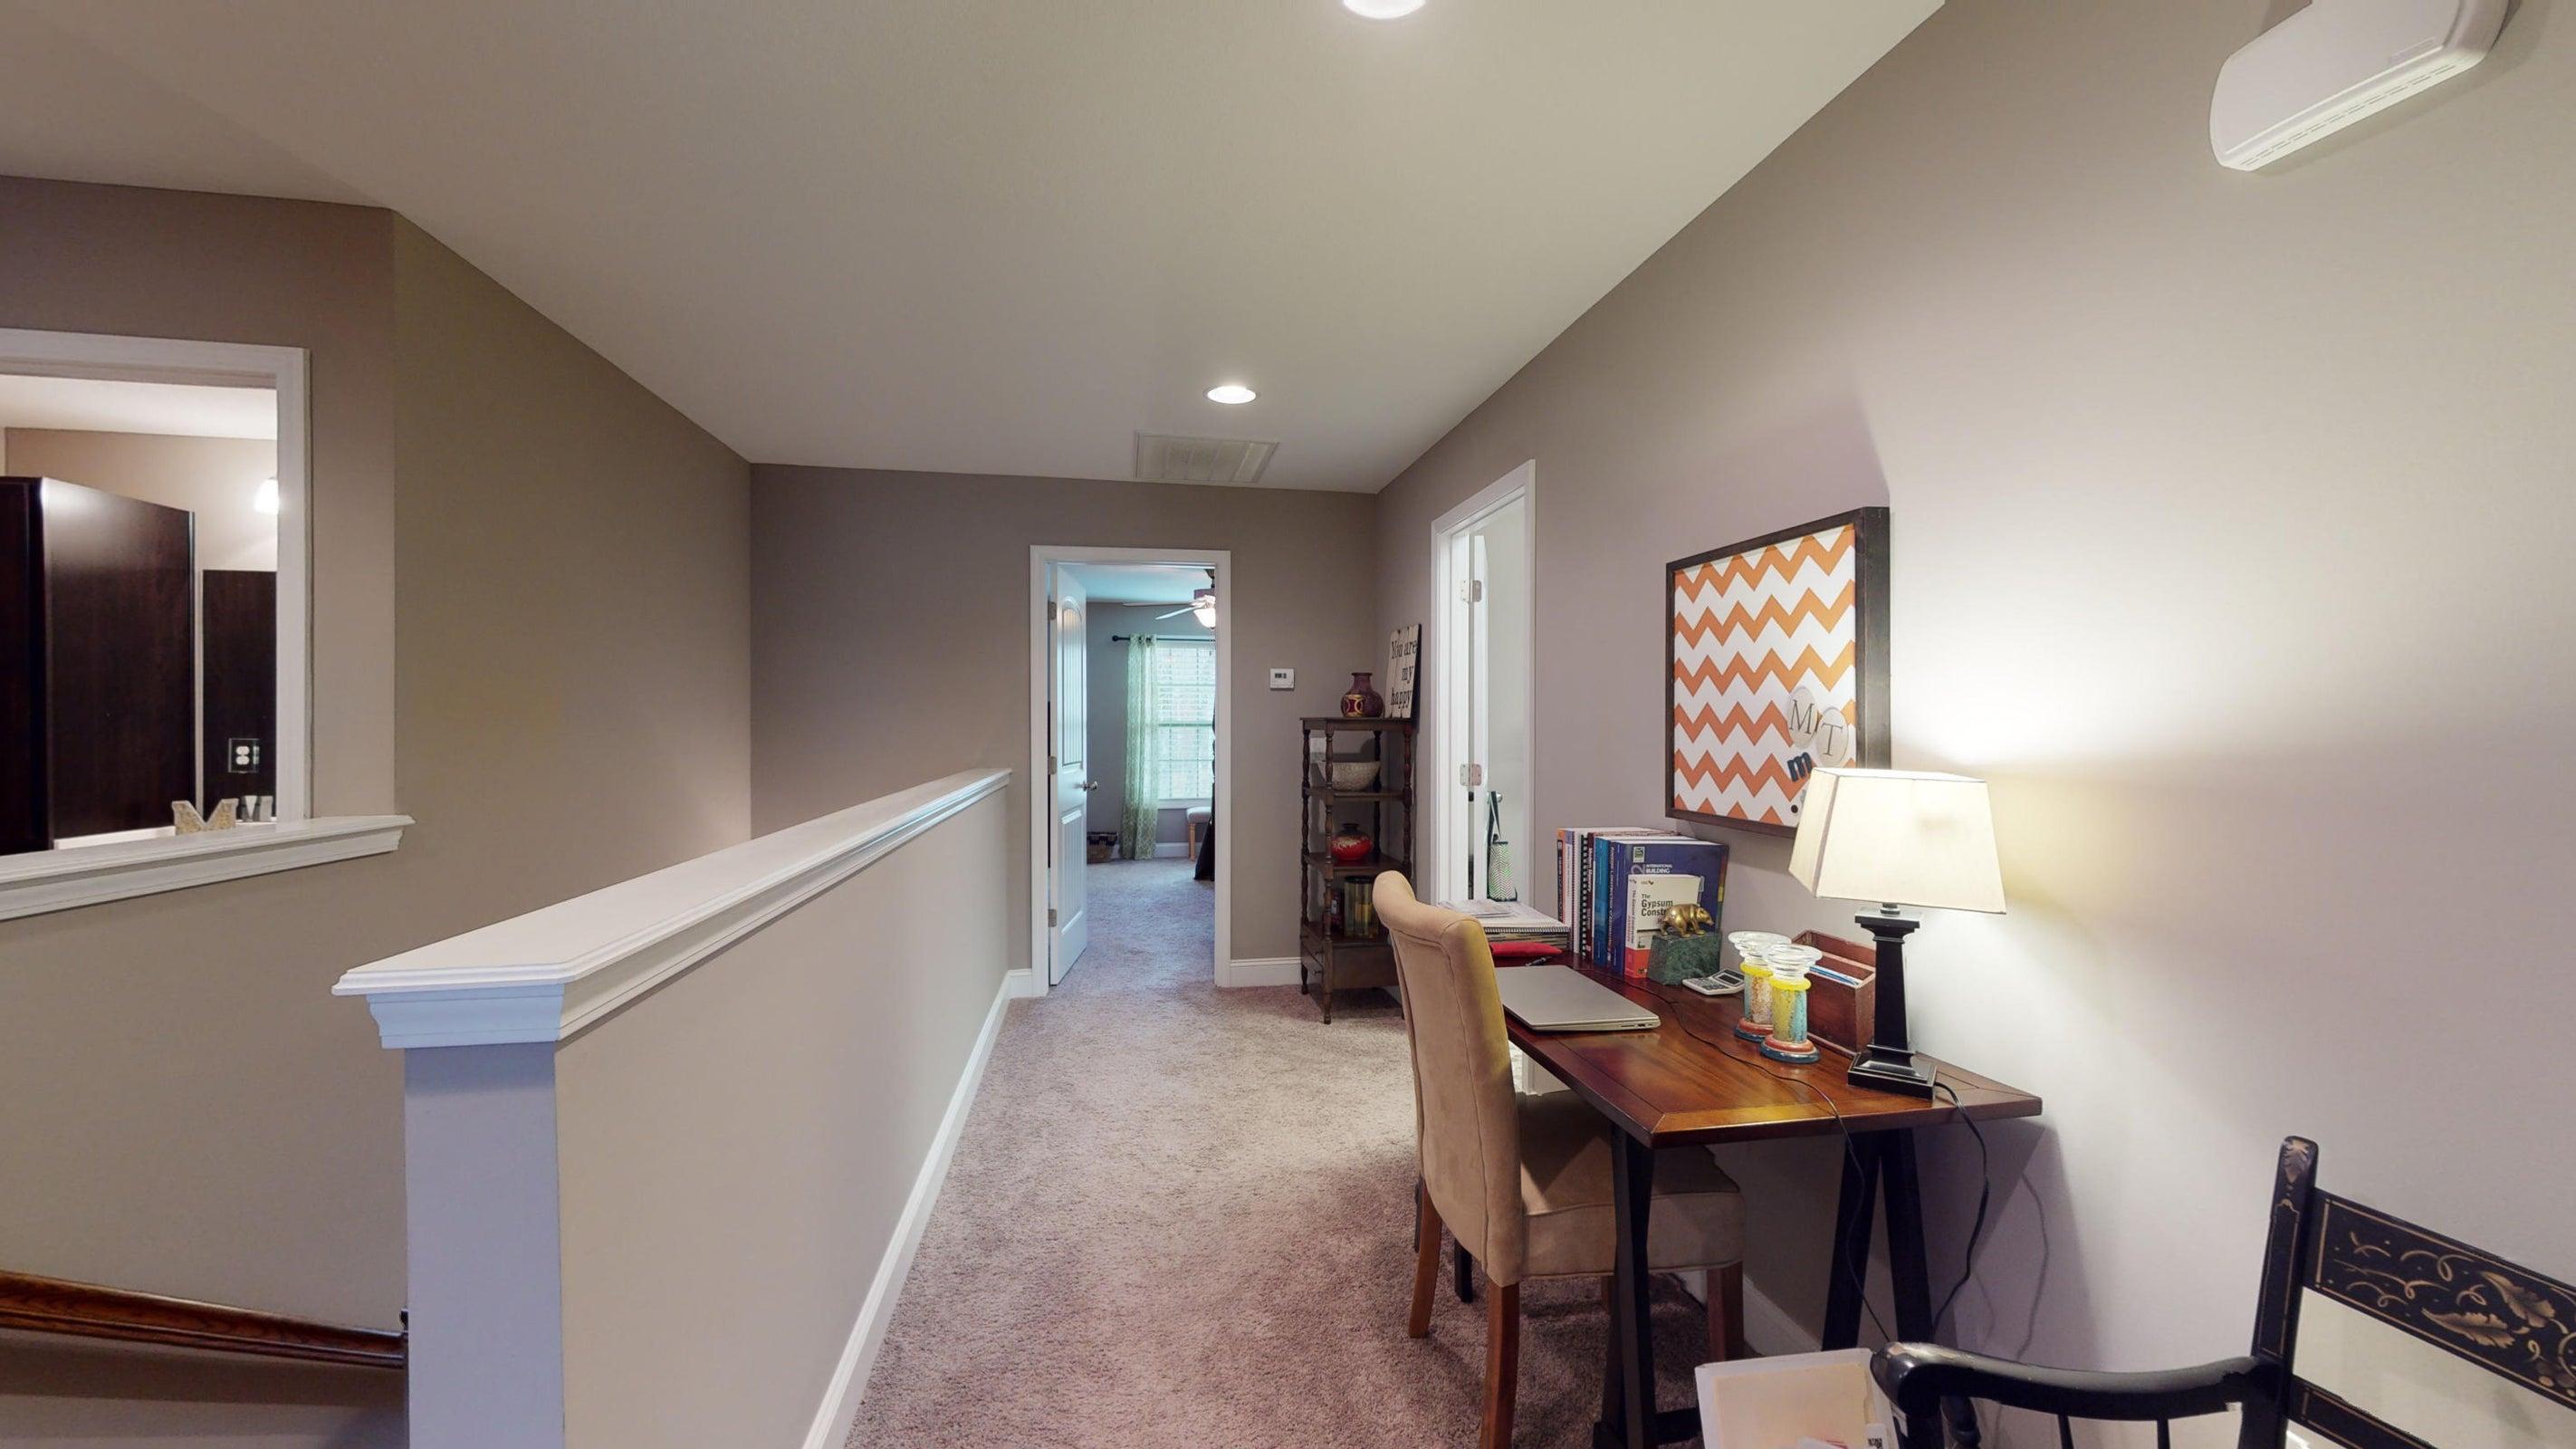 2352-Madeline-lane-Upstairs-Hall-2